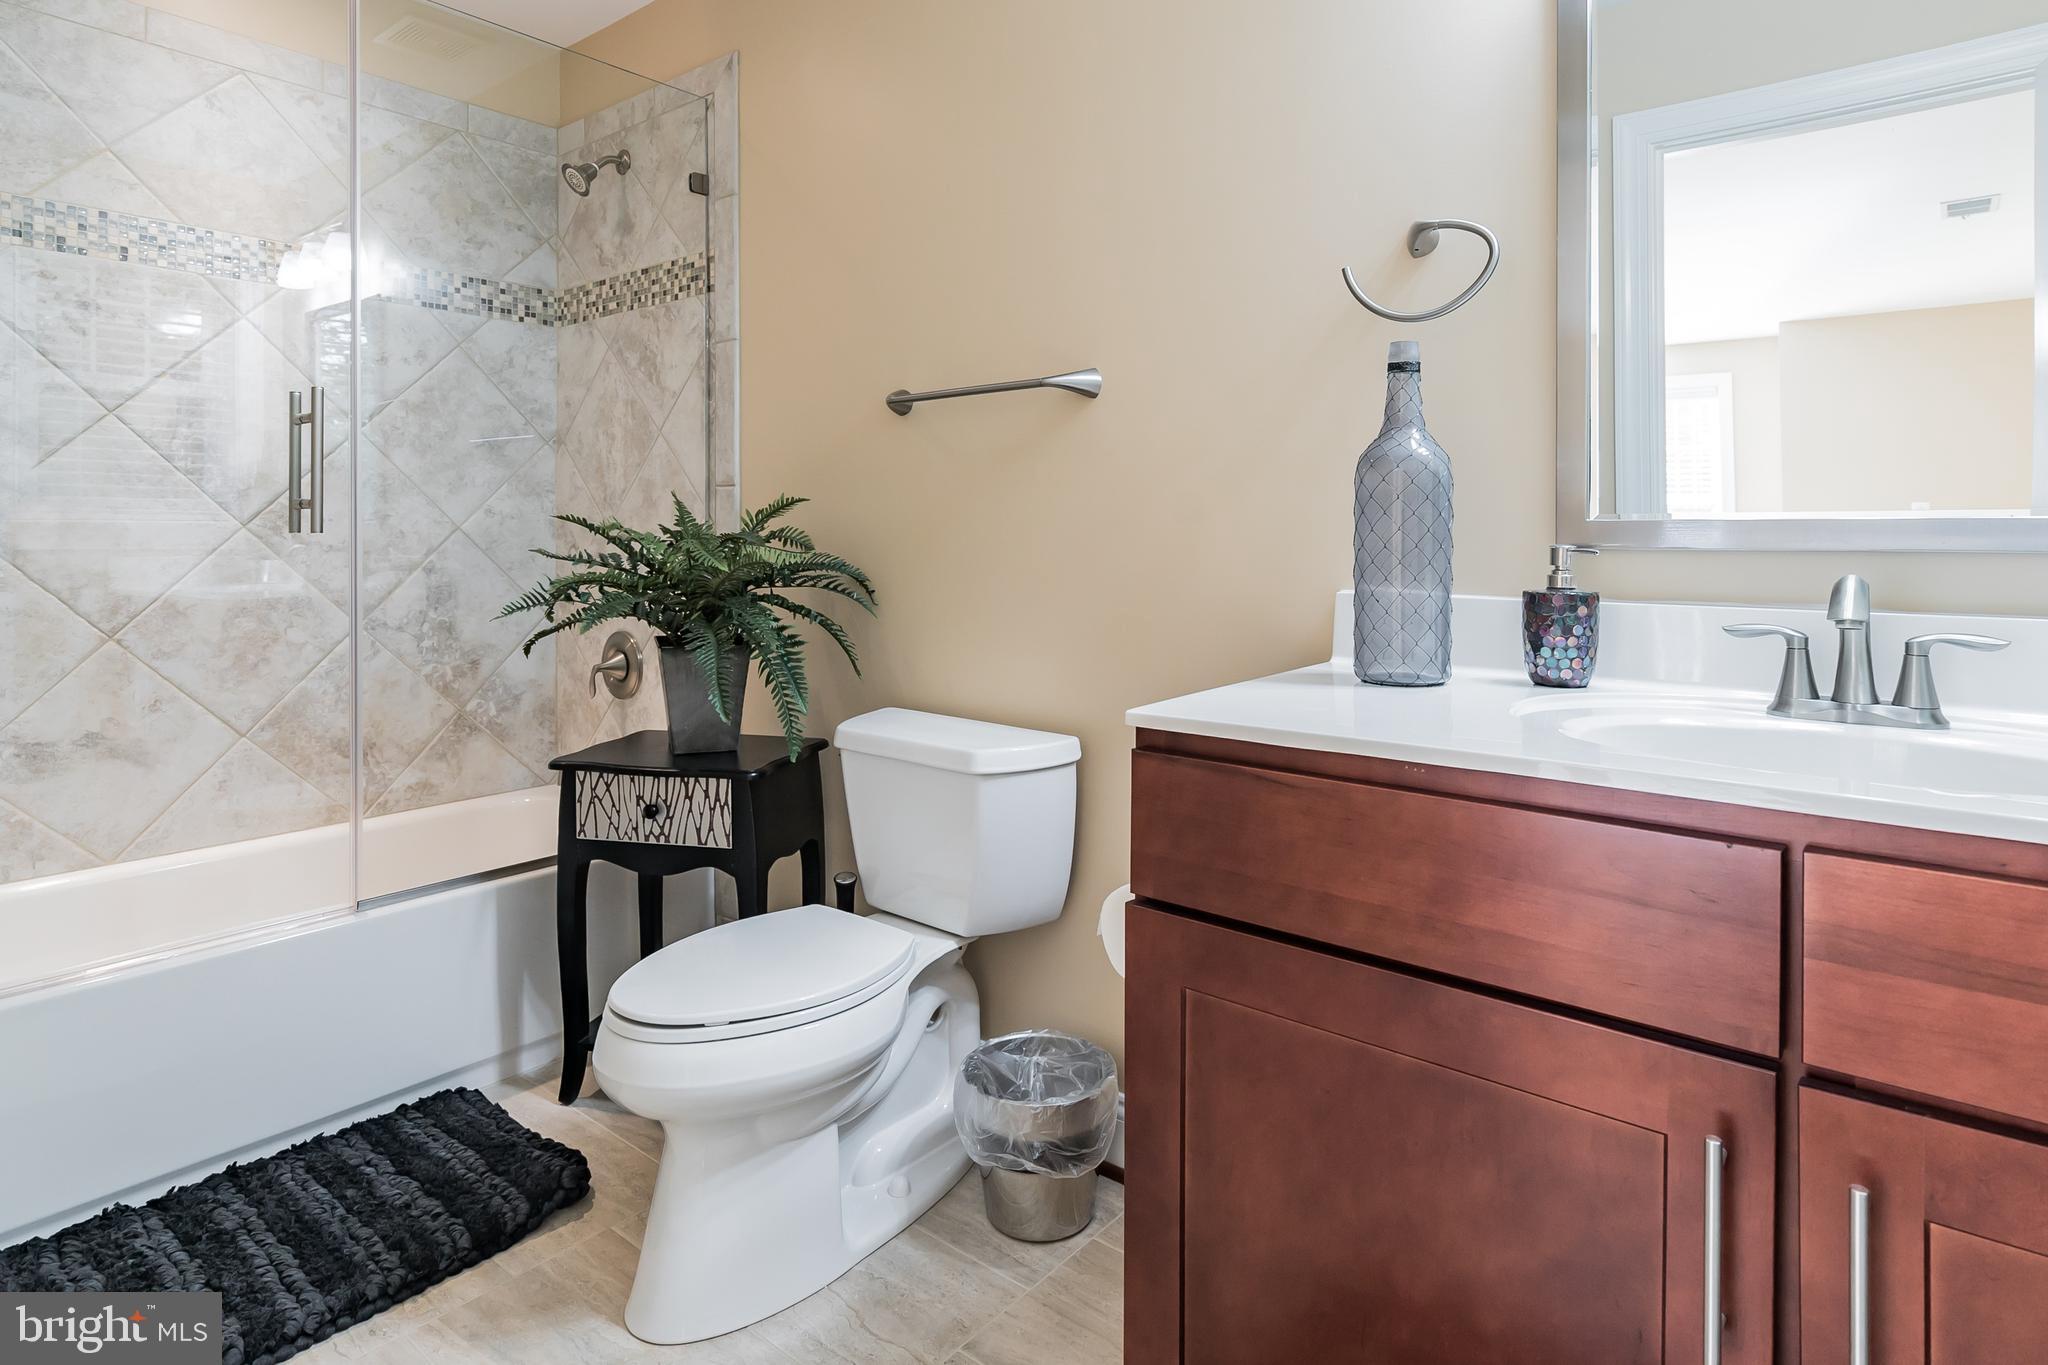 7000 JACOBS GROVE CT, Manas, VA 20112 $997,500 MLS ... on